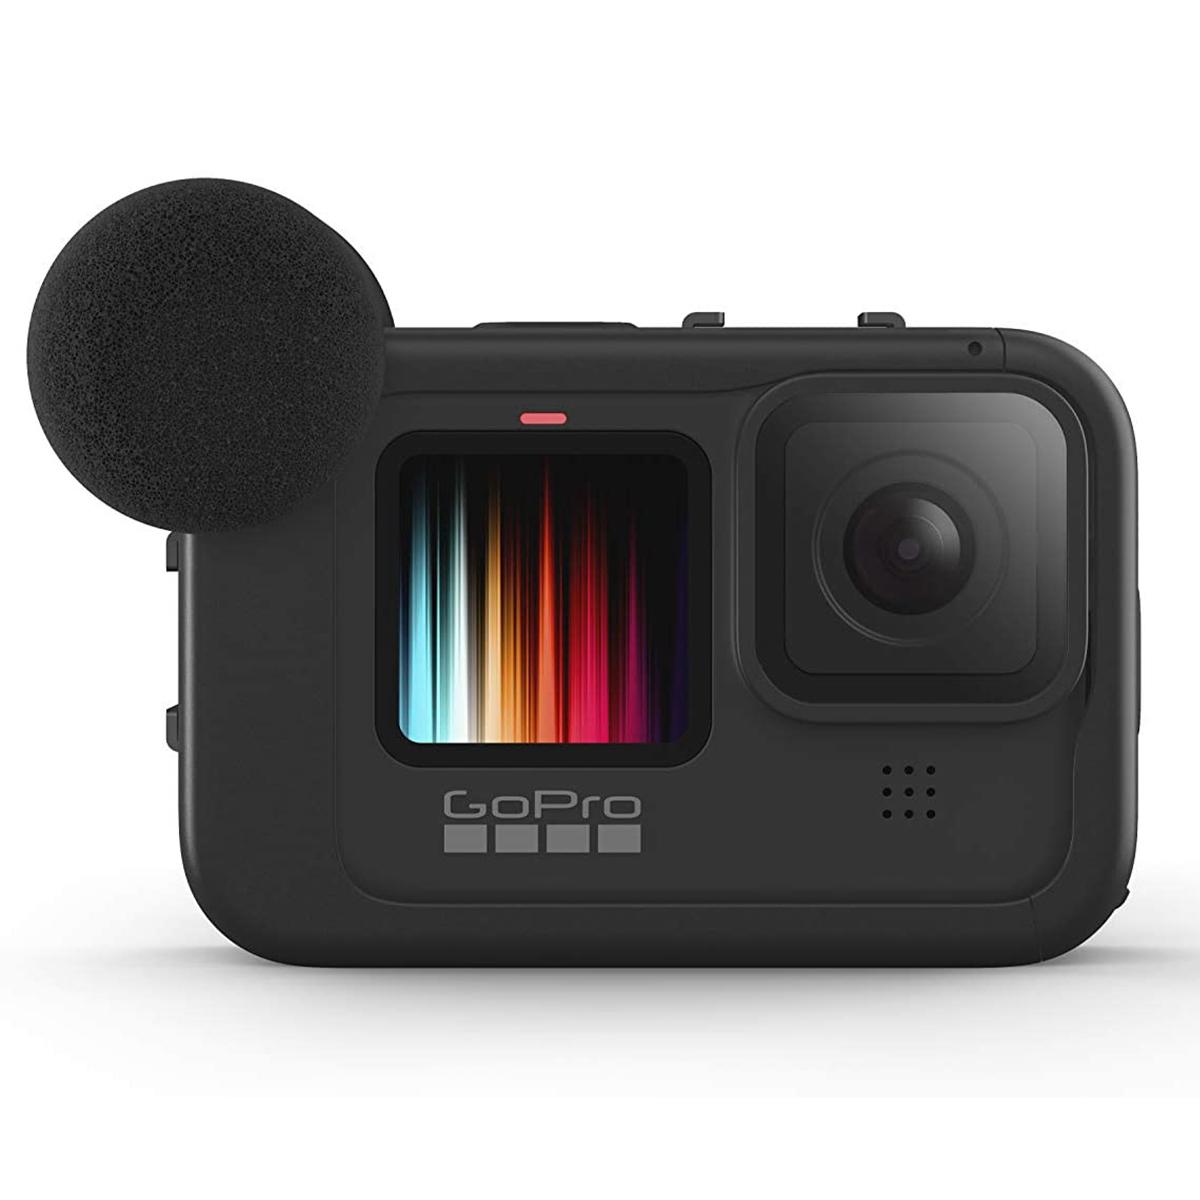 Módulo de Mídia GoPro Hero9 Black - Media Mod - ADFMD-001